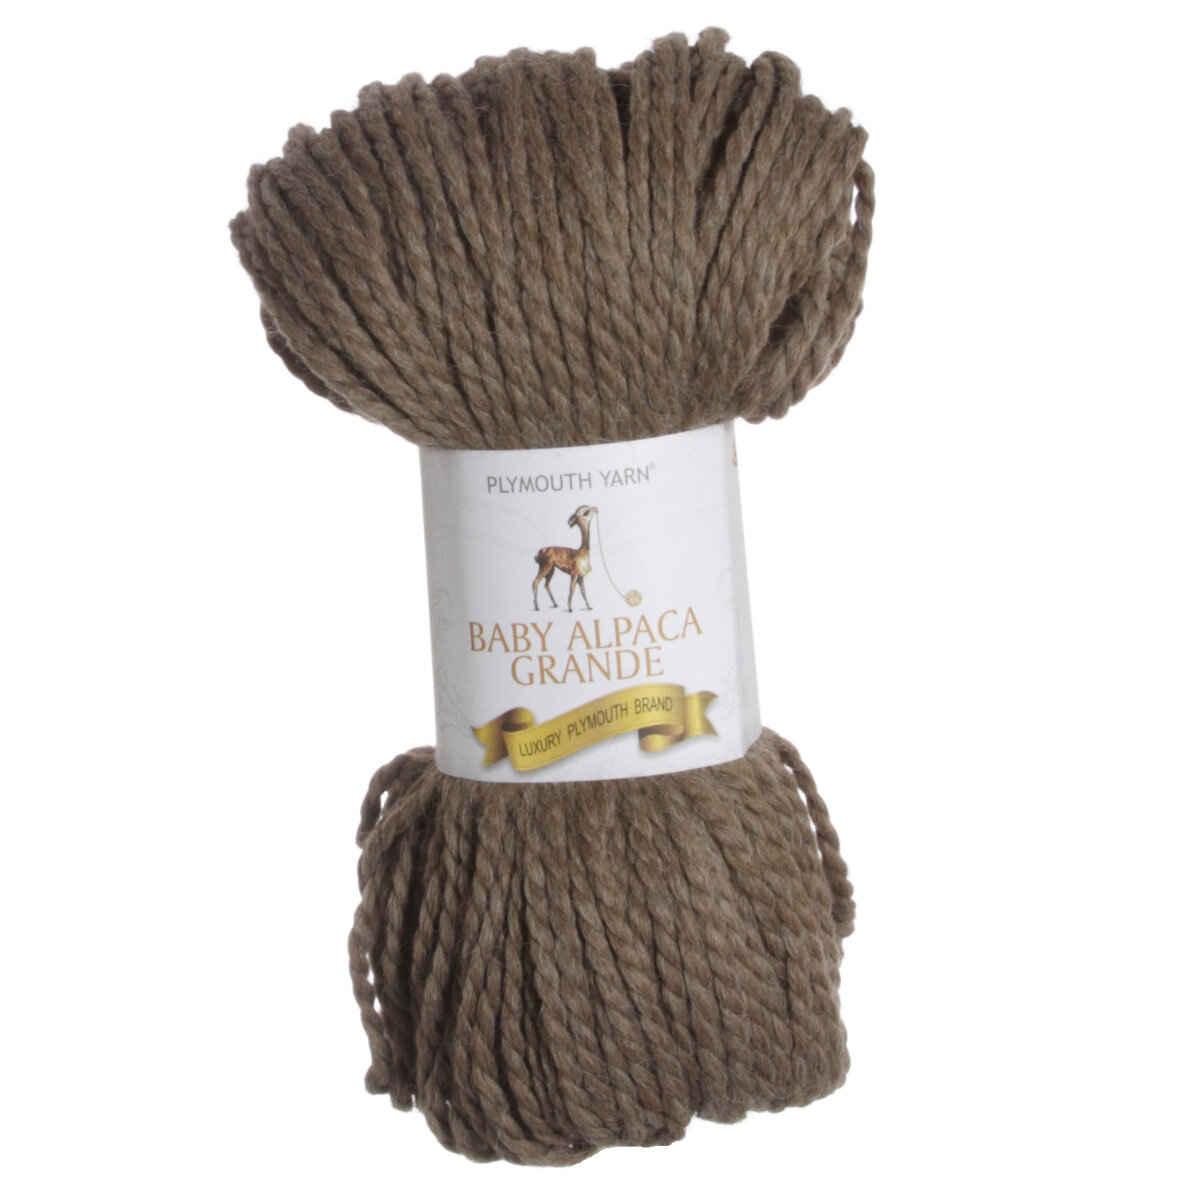 Plymouth Yarn Baby Alpaca Grande Yarn 7711 Wood Heather